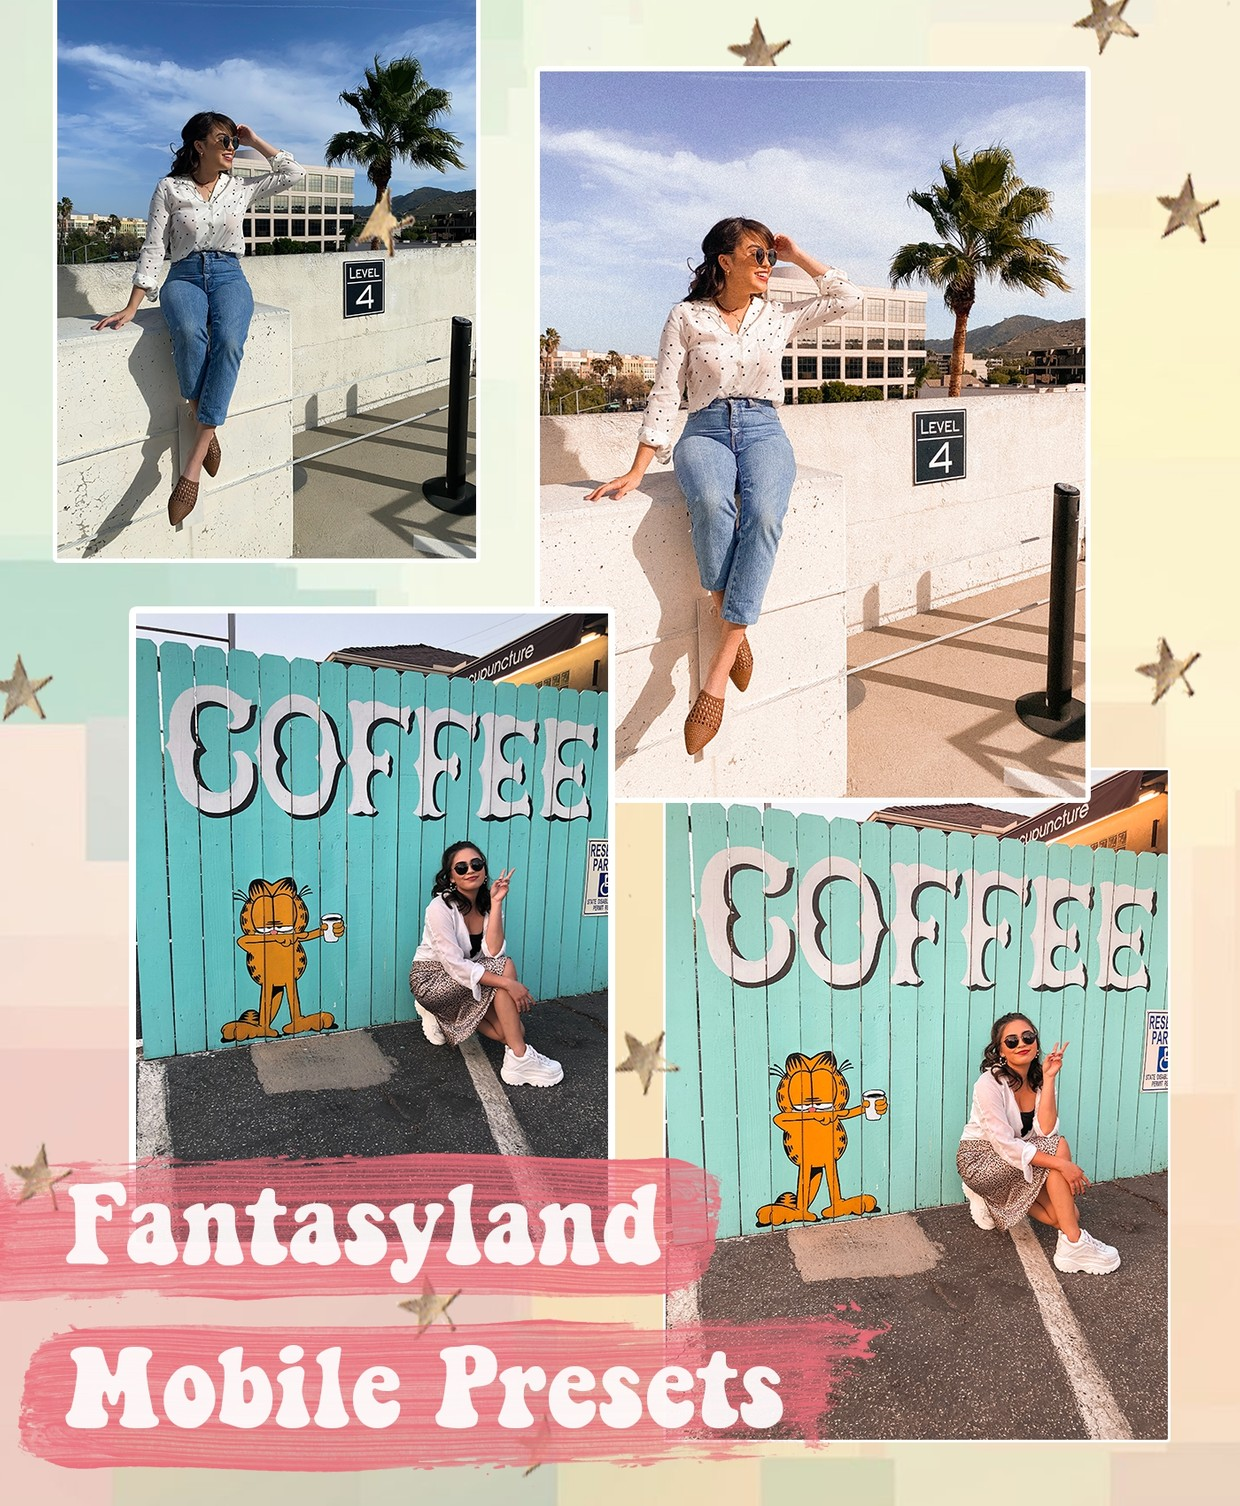 Fantasyland Preset Pack - MOBILE #JessPresets